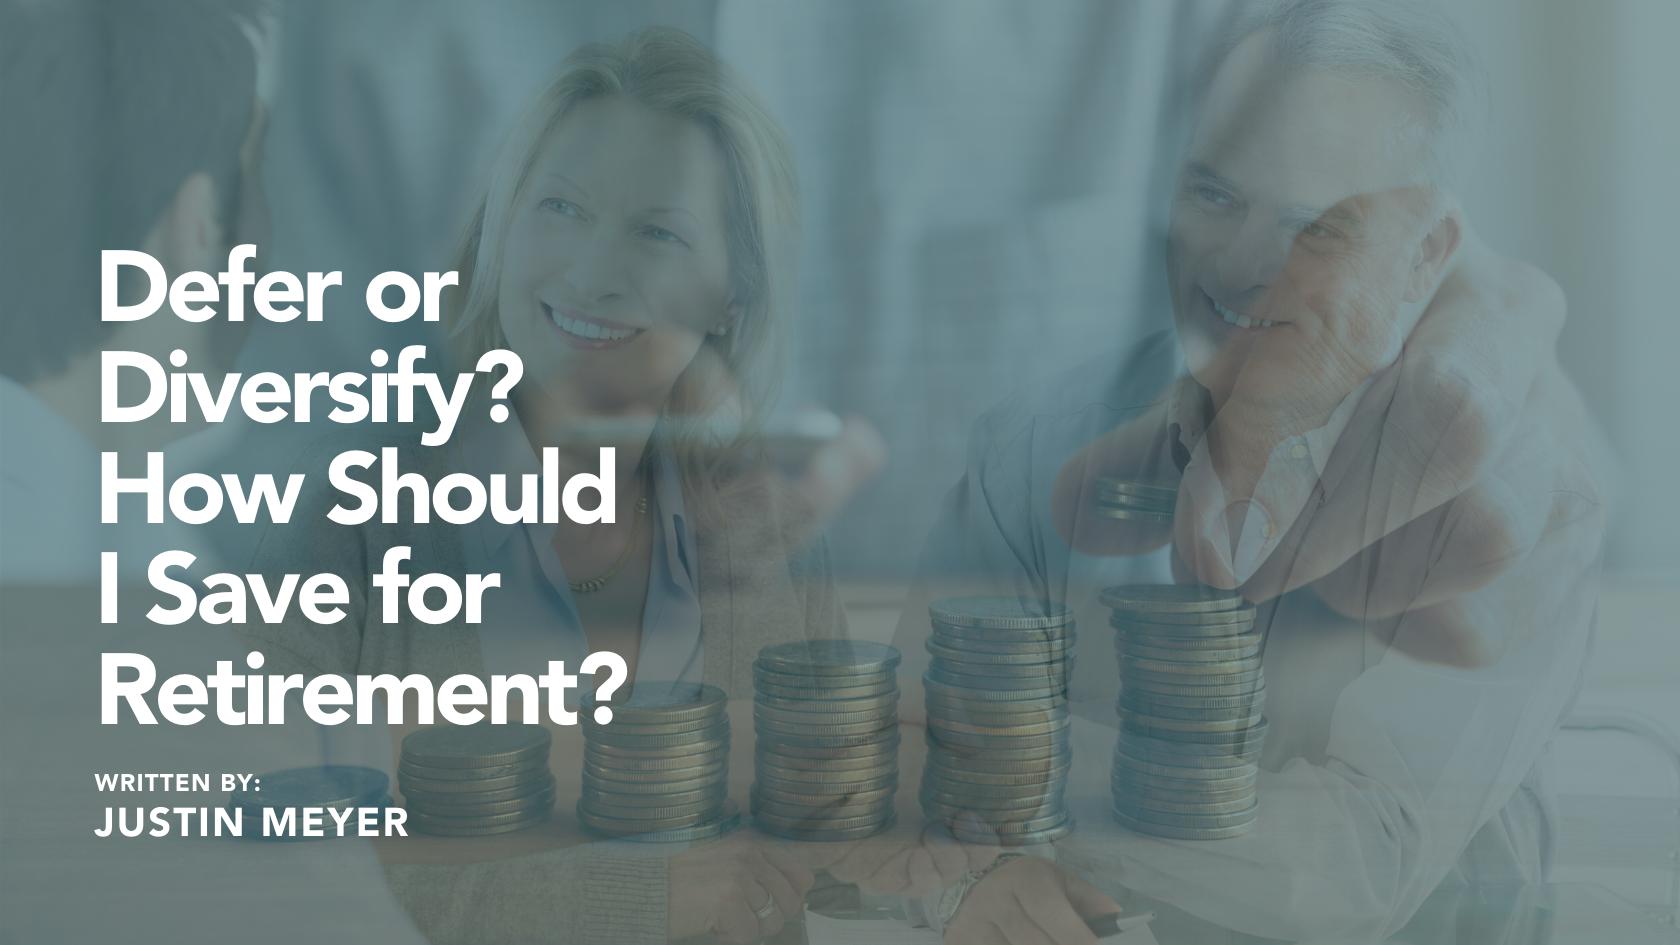 Defer or Diversify? How Should I Save for Retirement? Thumbnail